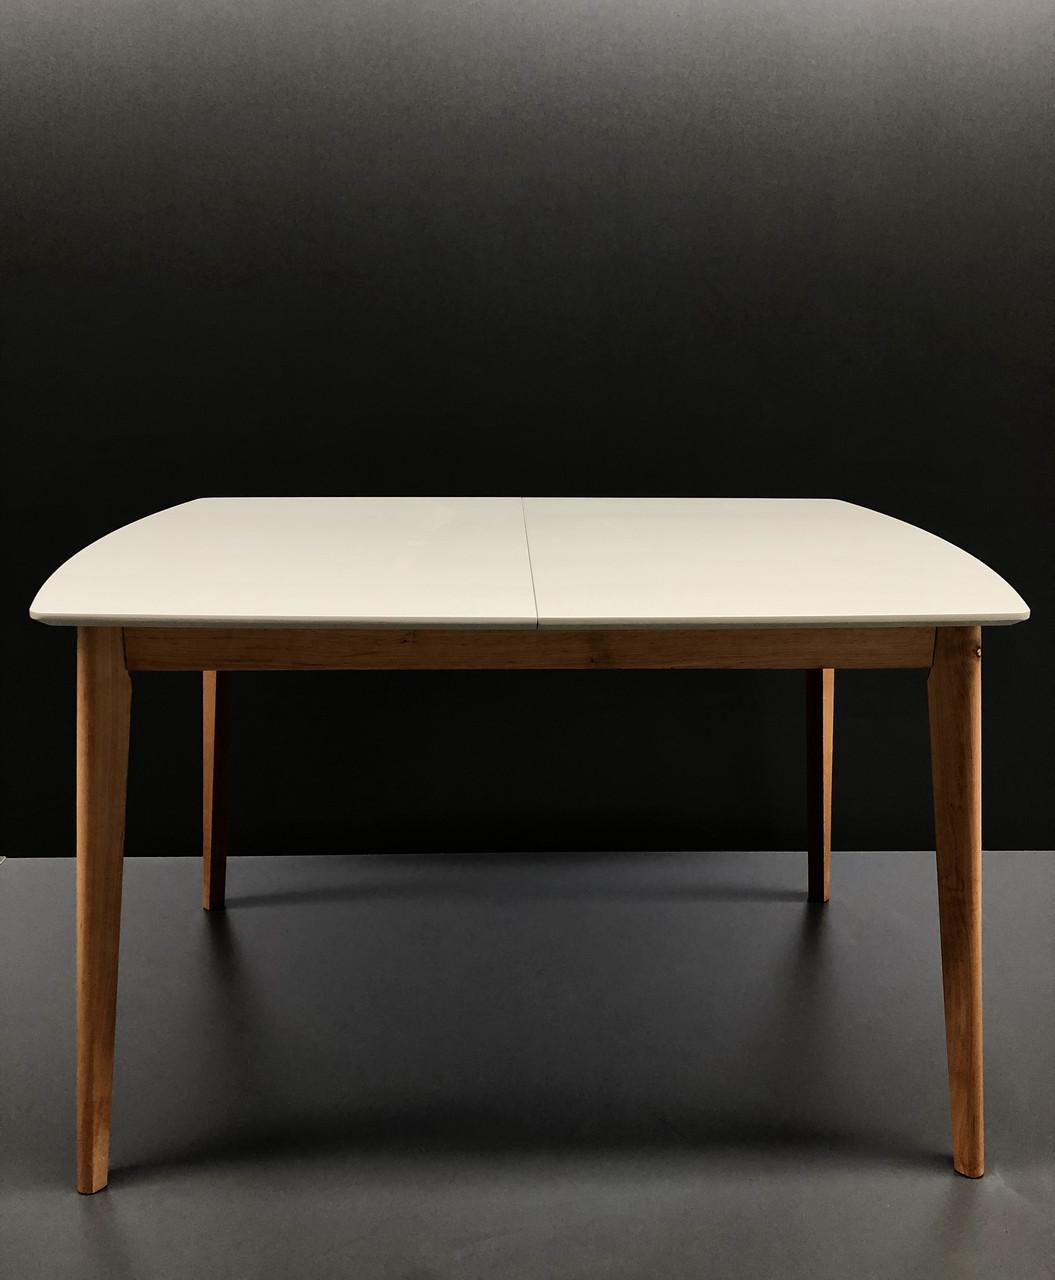 Стол обеденный Intarsio Exen II 120(160)х80 см Серый